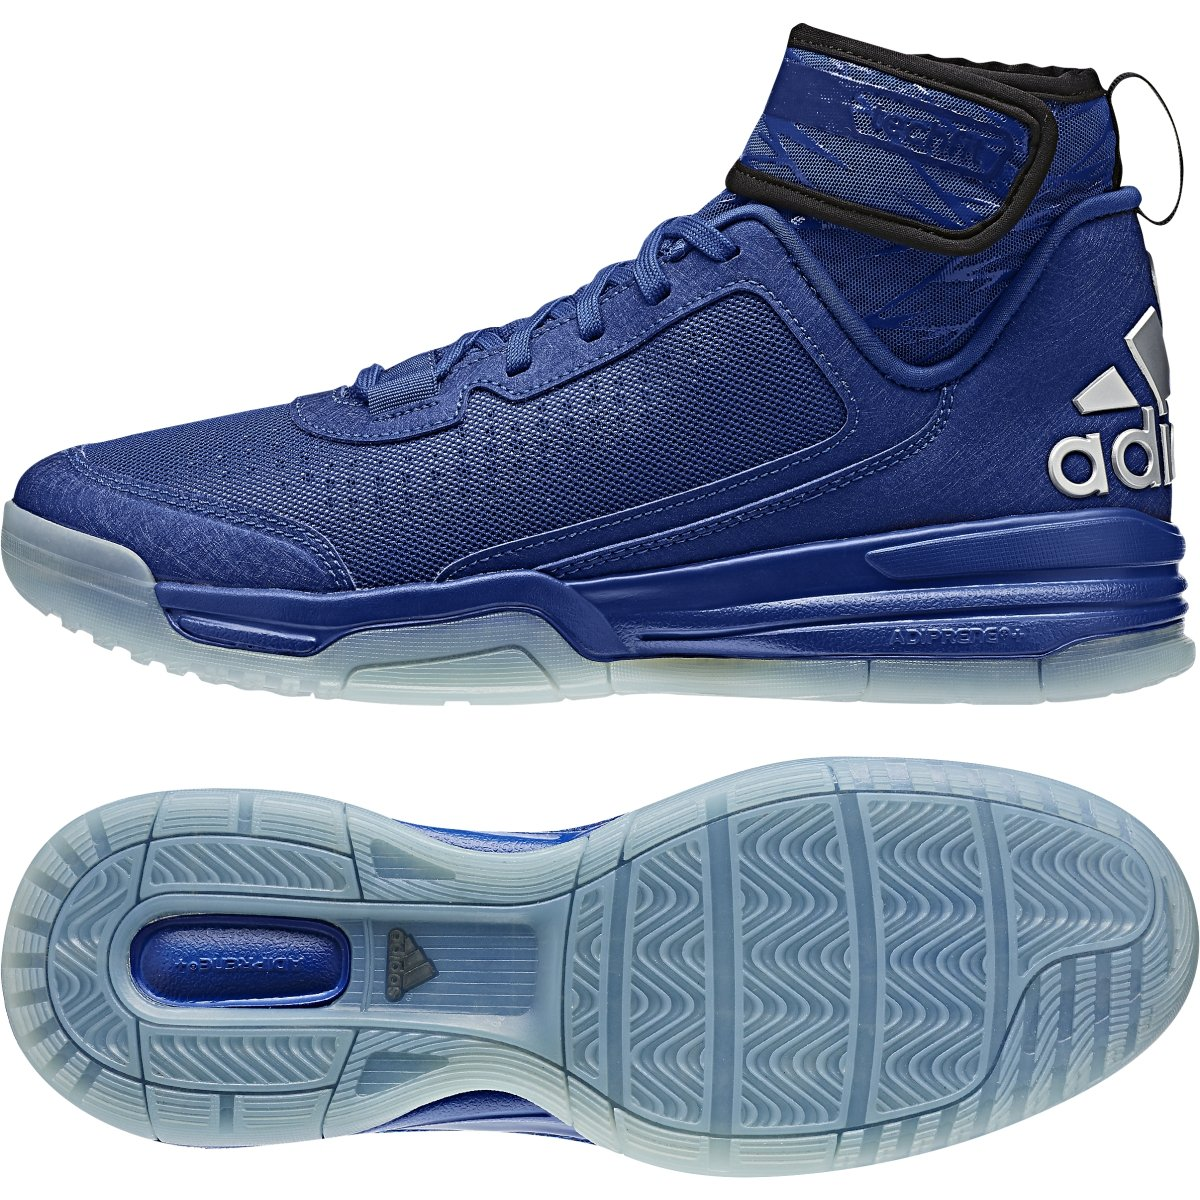 save off 851f2 d3049 Galleon - Adidas Mens Dual Threat BB Basketball Shoes RoyalBlackWhite (10)